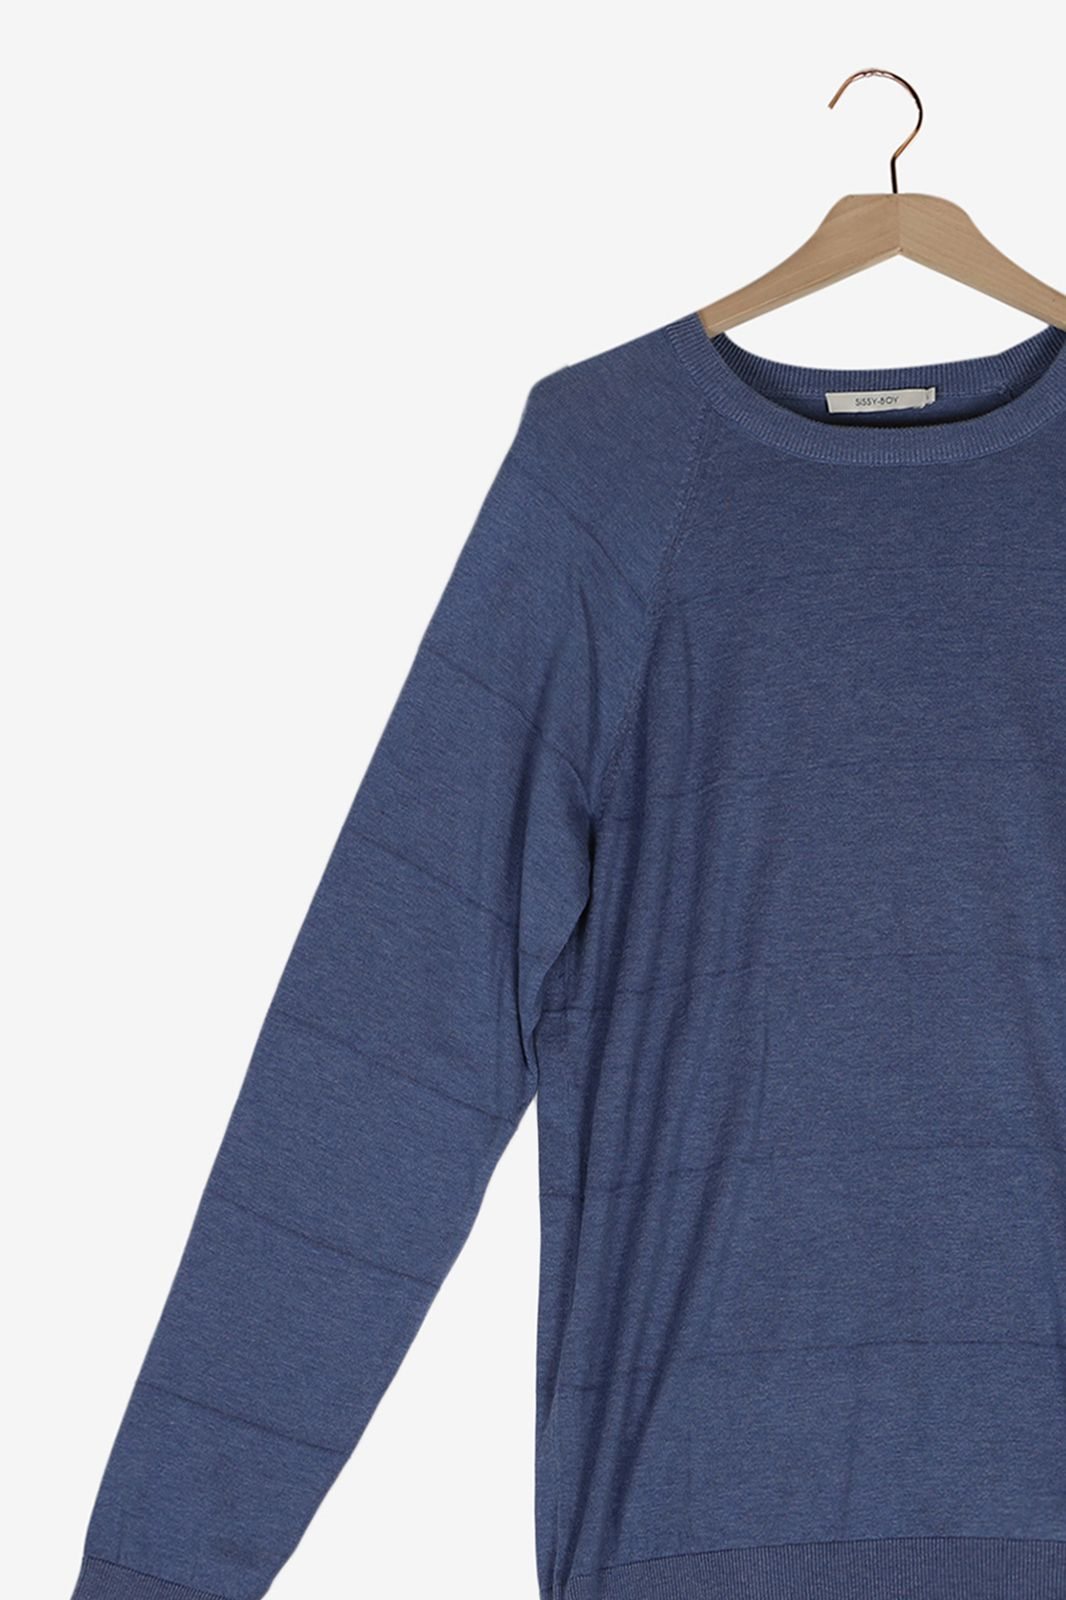 Blauwe knitted trui - Heren   Sissy-Boy